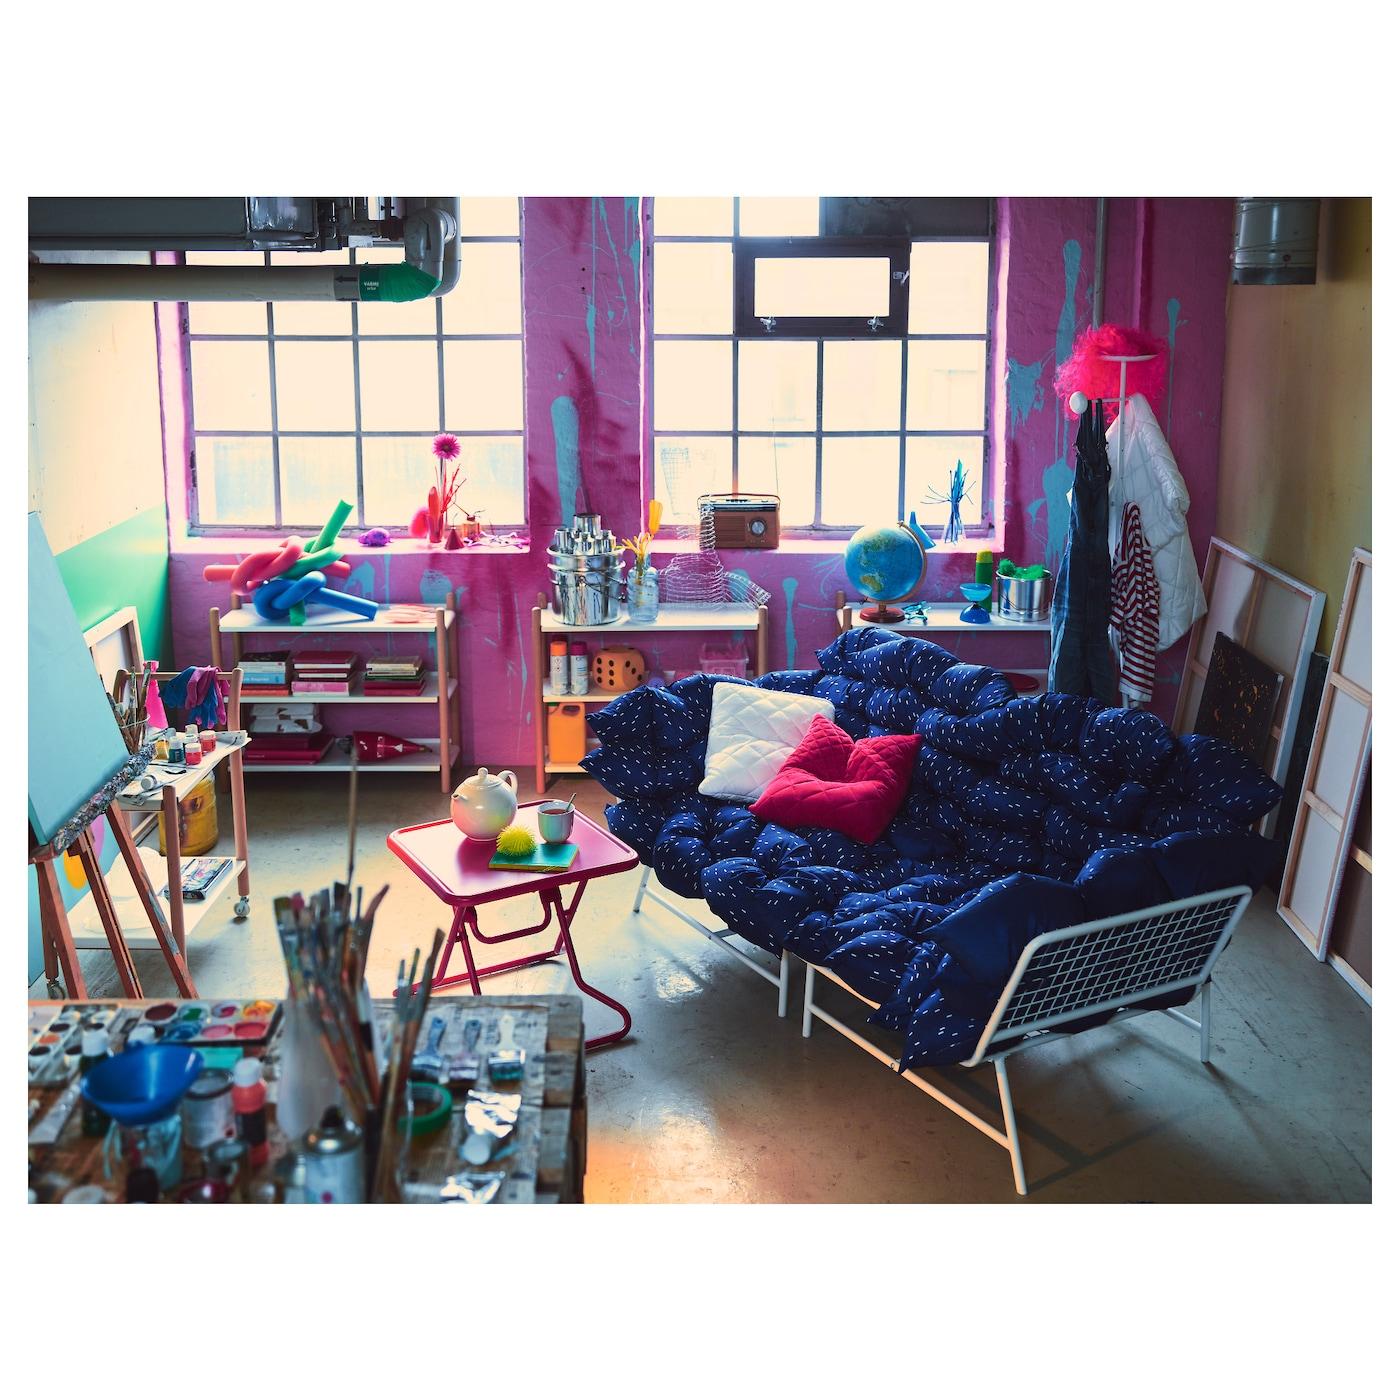 ikea ps 2017 2 seat sofa with 36 cushions white dark blue ikea. Black Bedroom Furniture Sets. Home Design Ideas